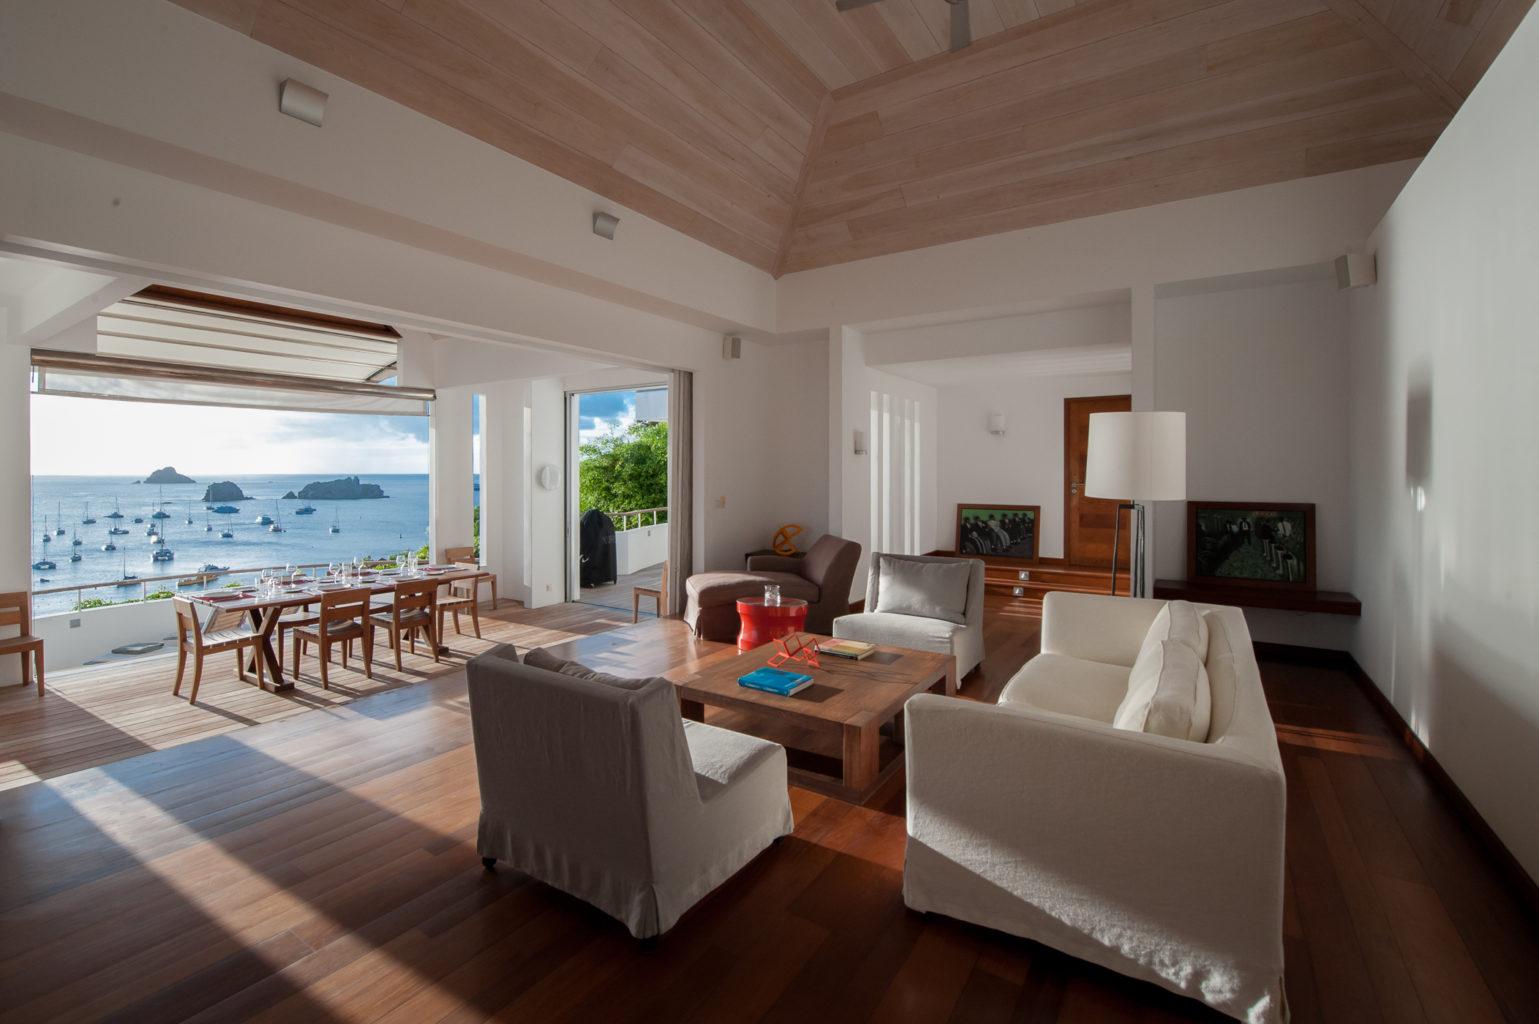 Villa Lam - Modern Villa for Rent with Fitness Equipment St Barth Gustavia - Living room